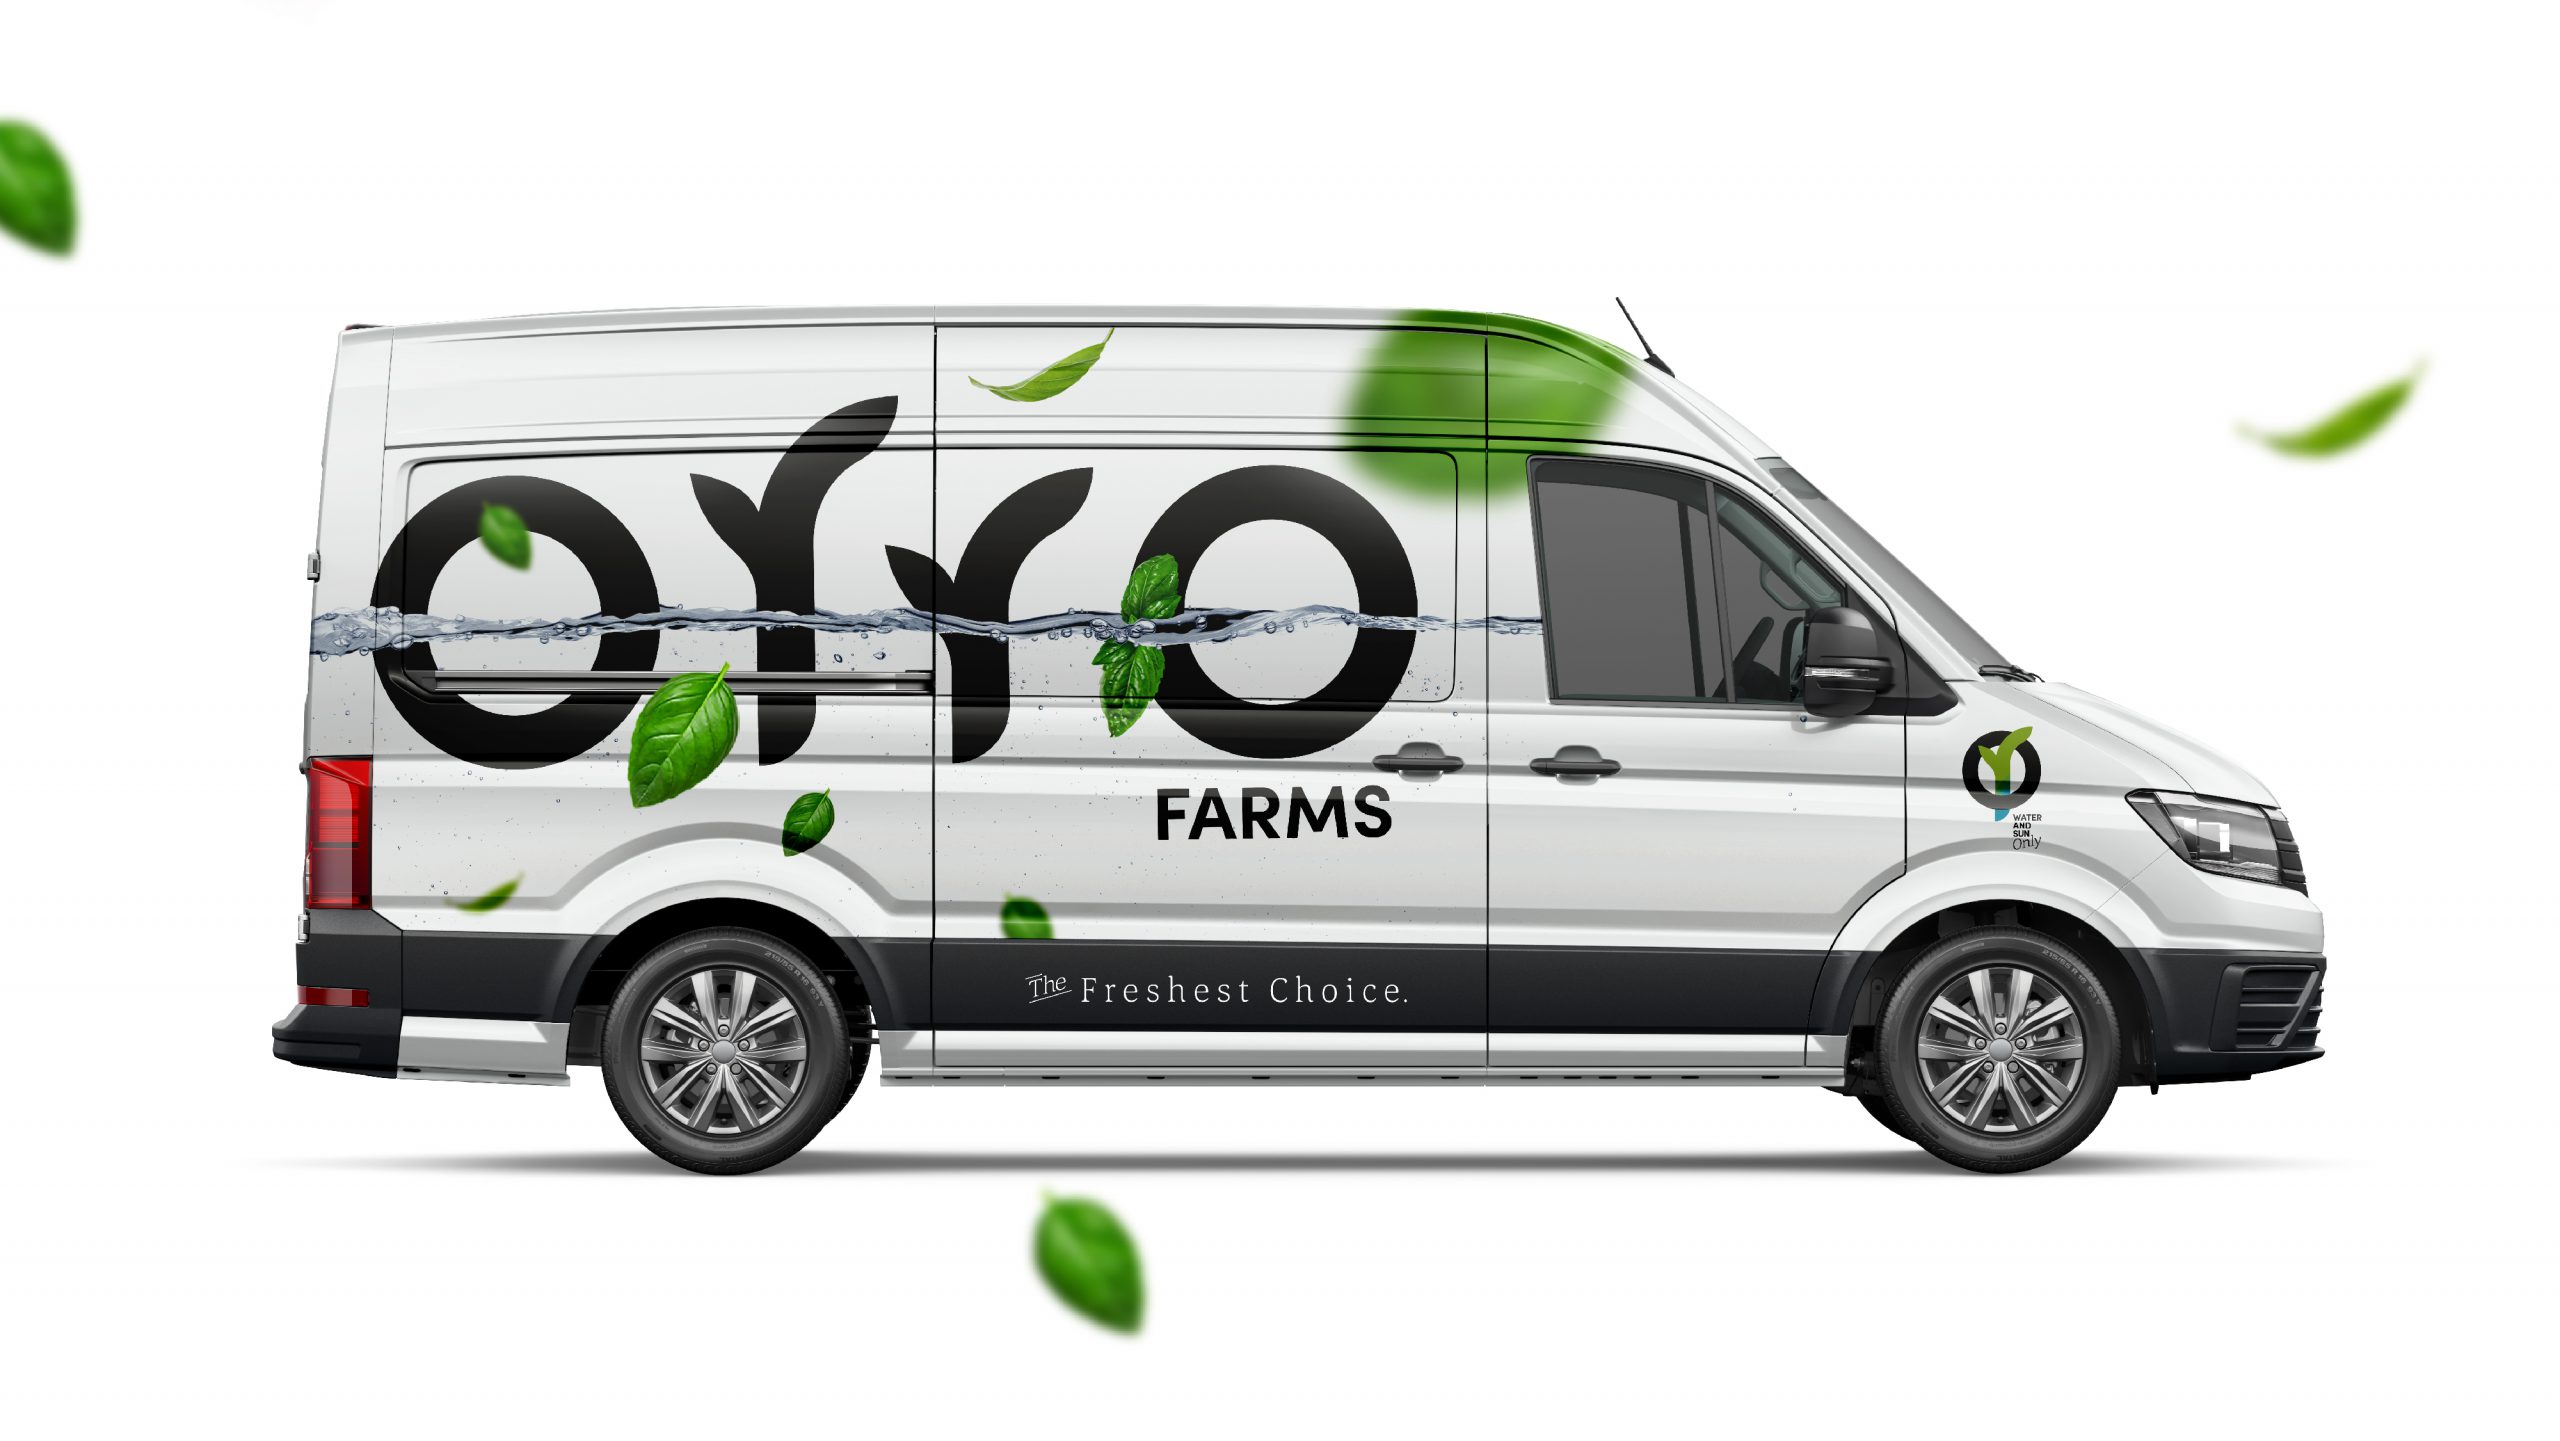 Orro-Farms-07